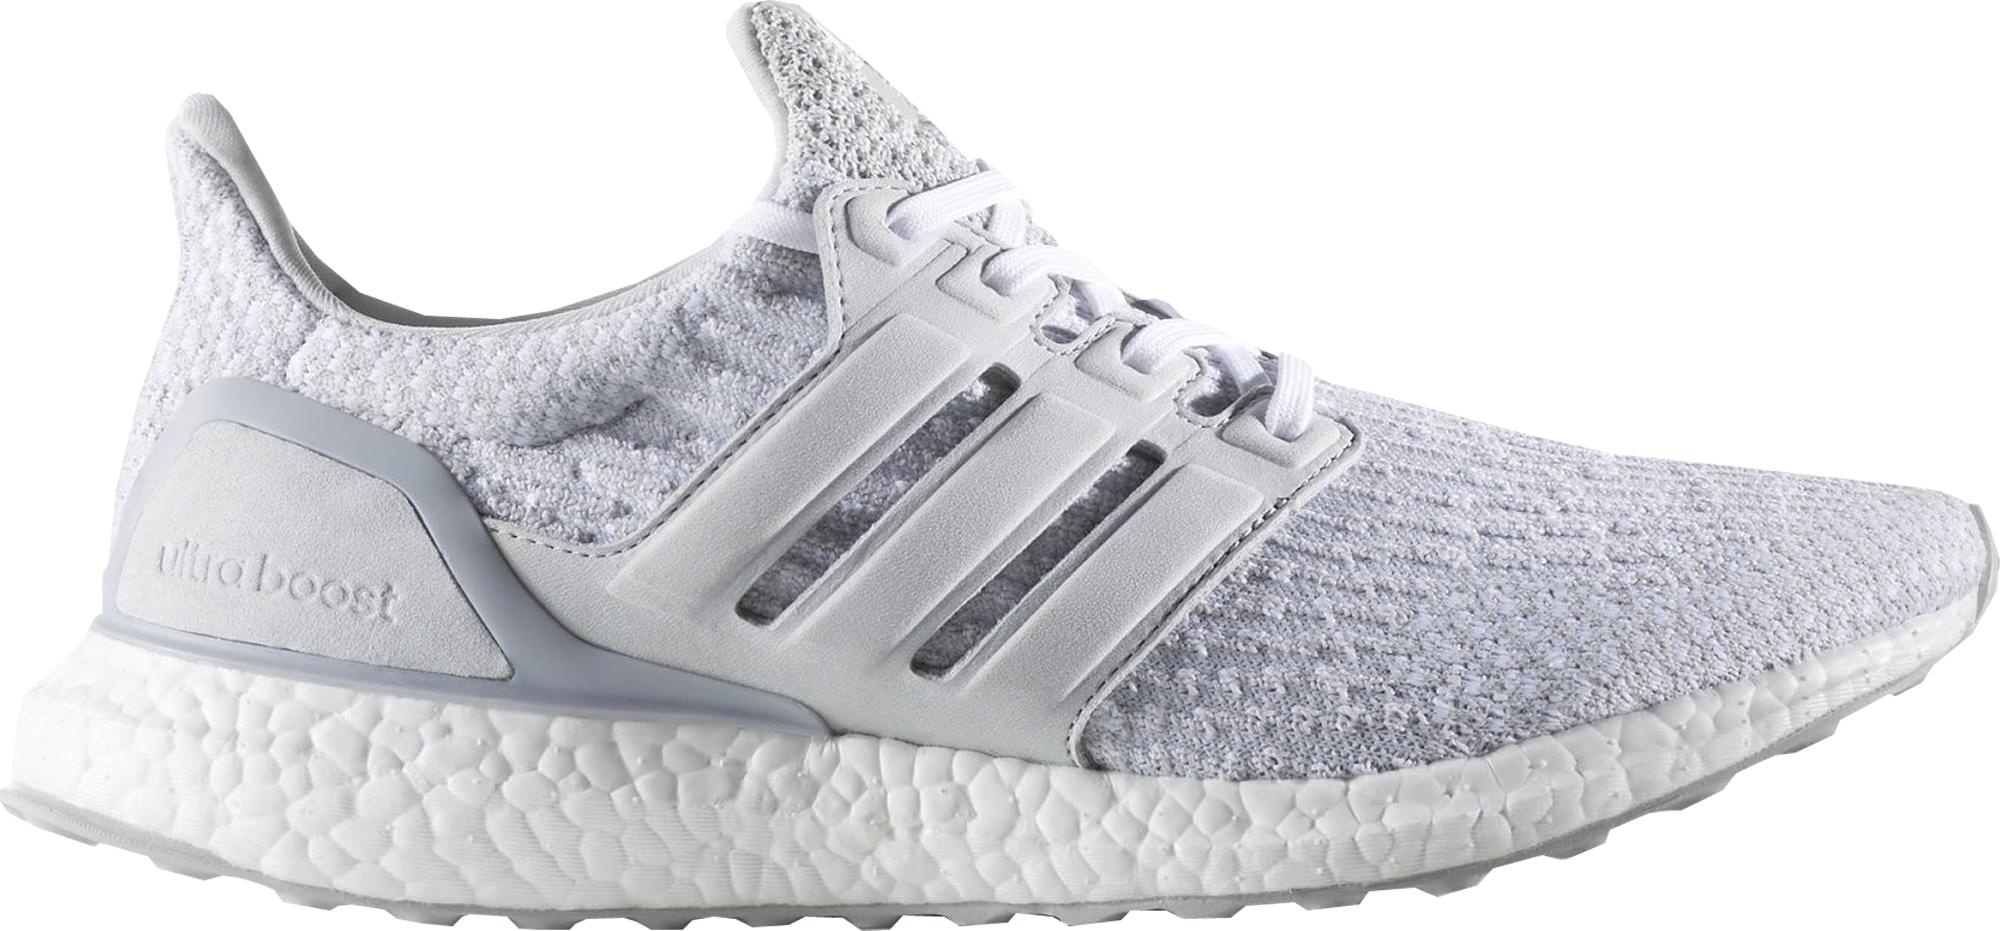 adidas Ultra Boost 3.0 Reigning Champ Grey